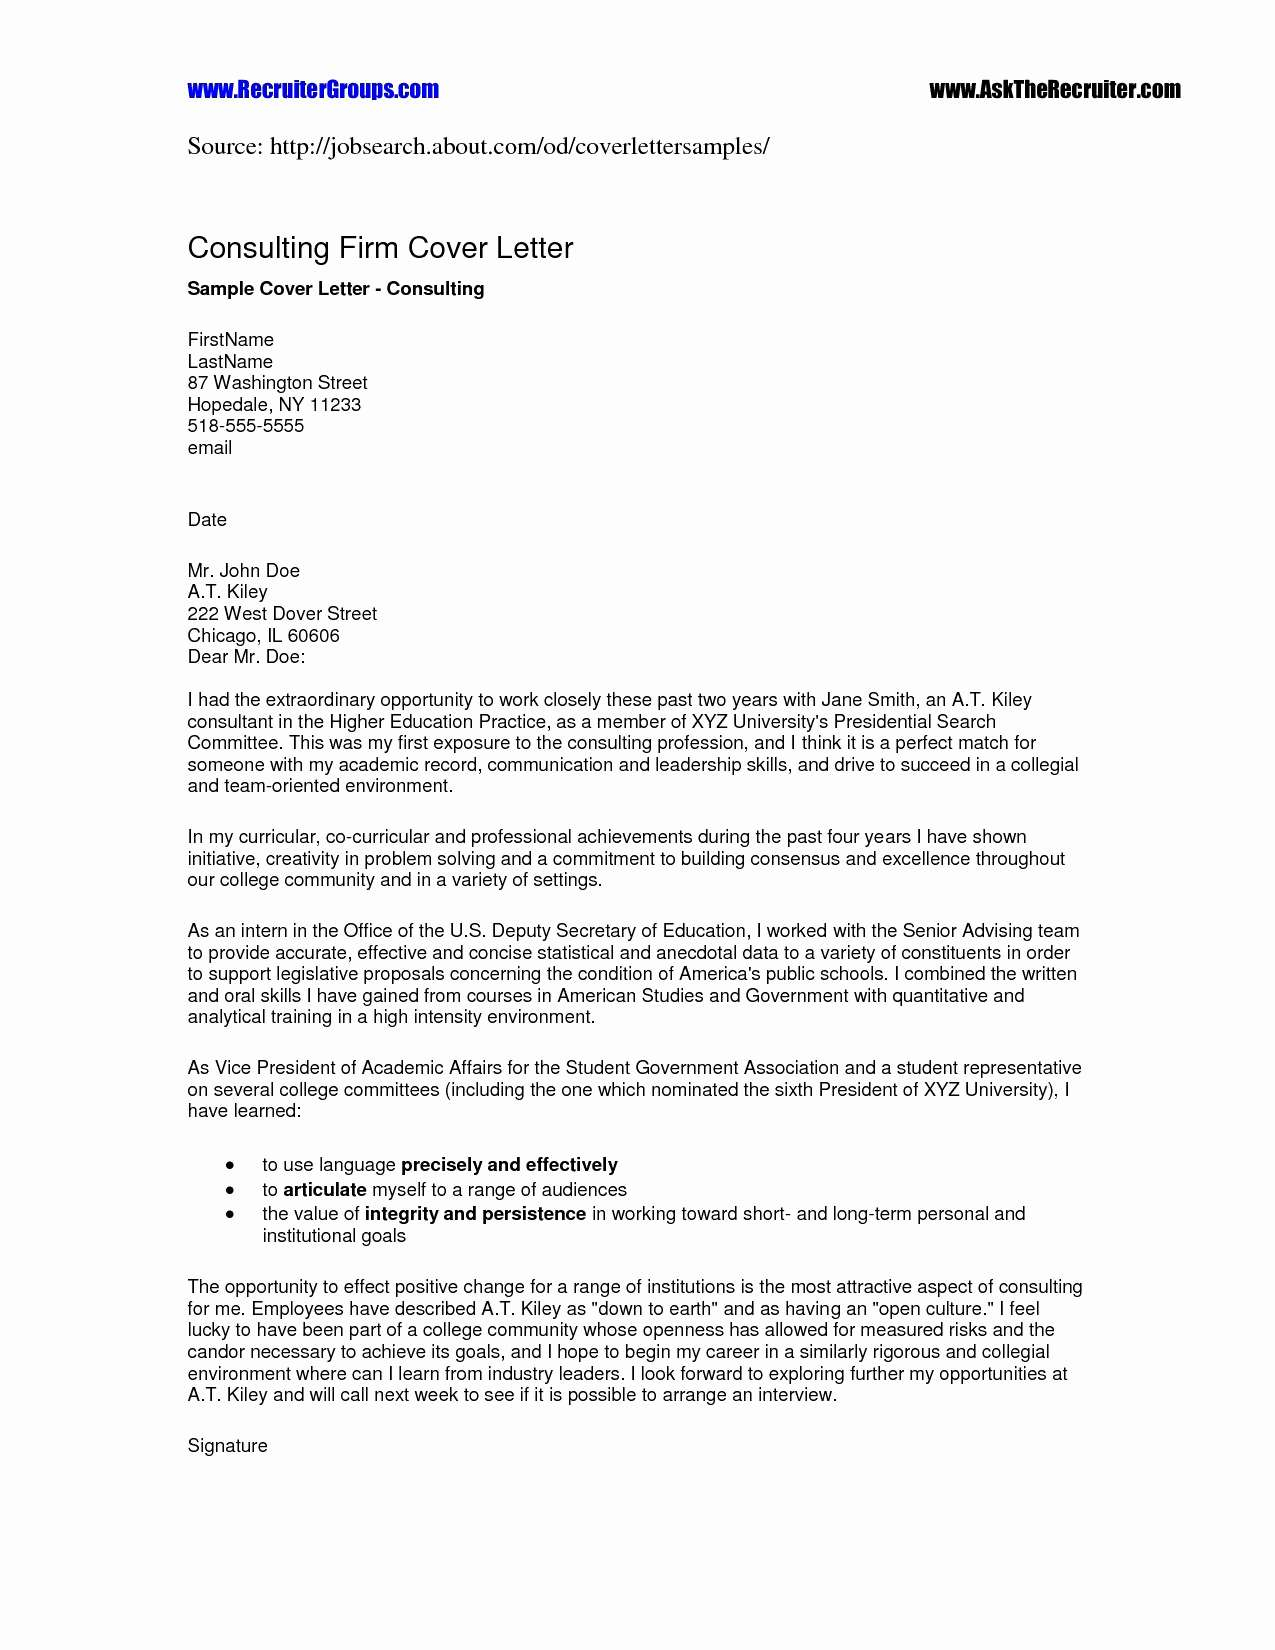 Resume Genius Cover Letter Template - Resume Genius Cover Letter Lovely Cover Letter Template Image